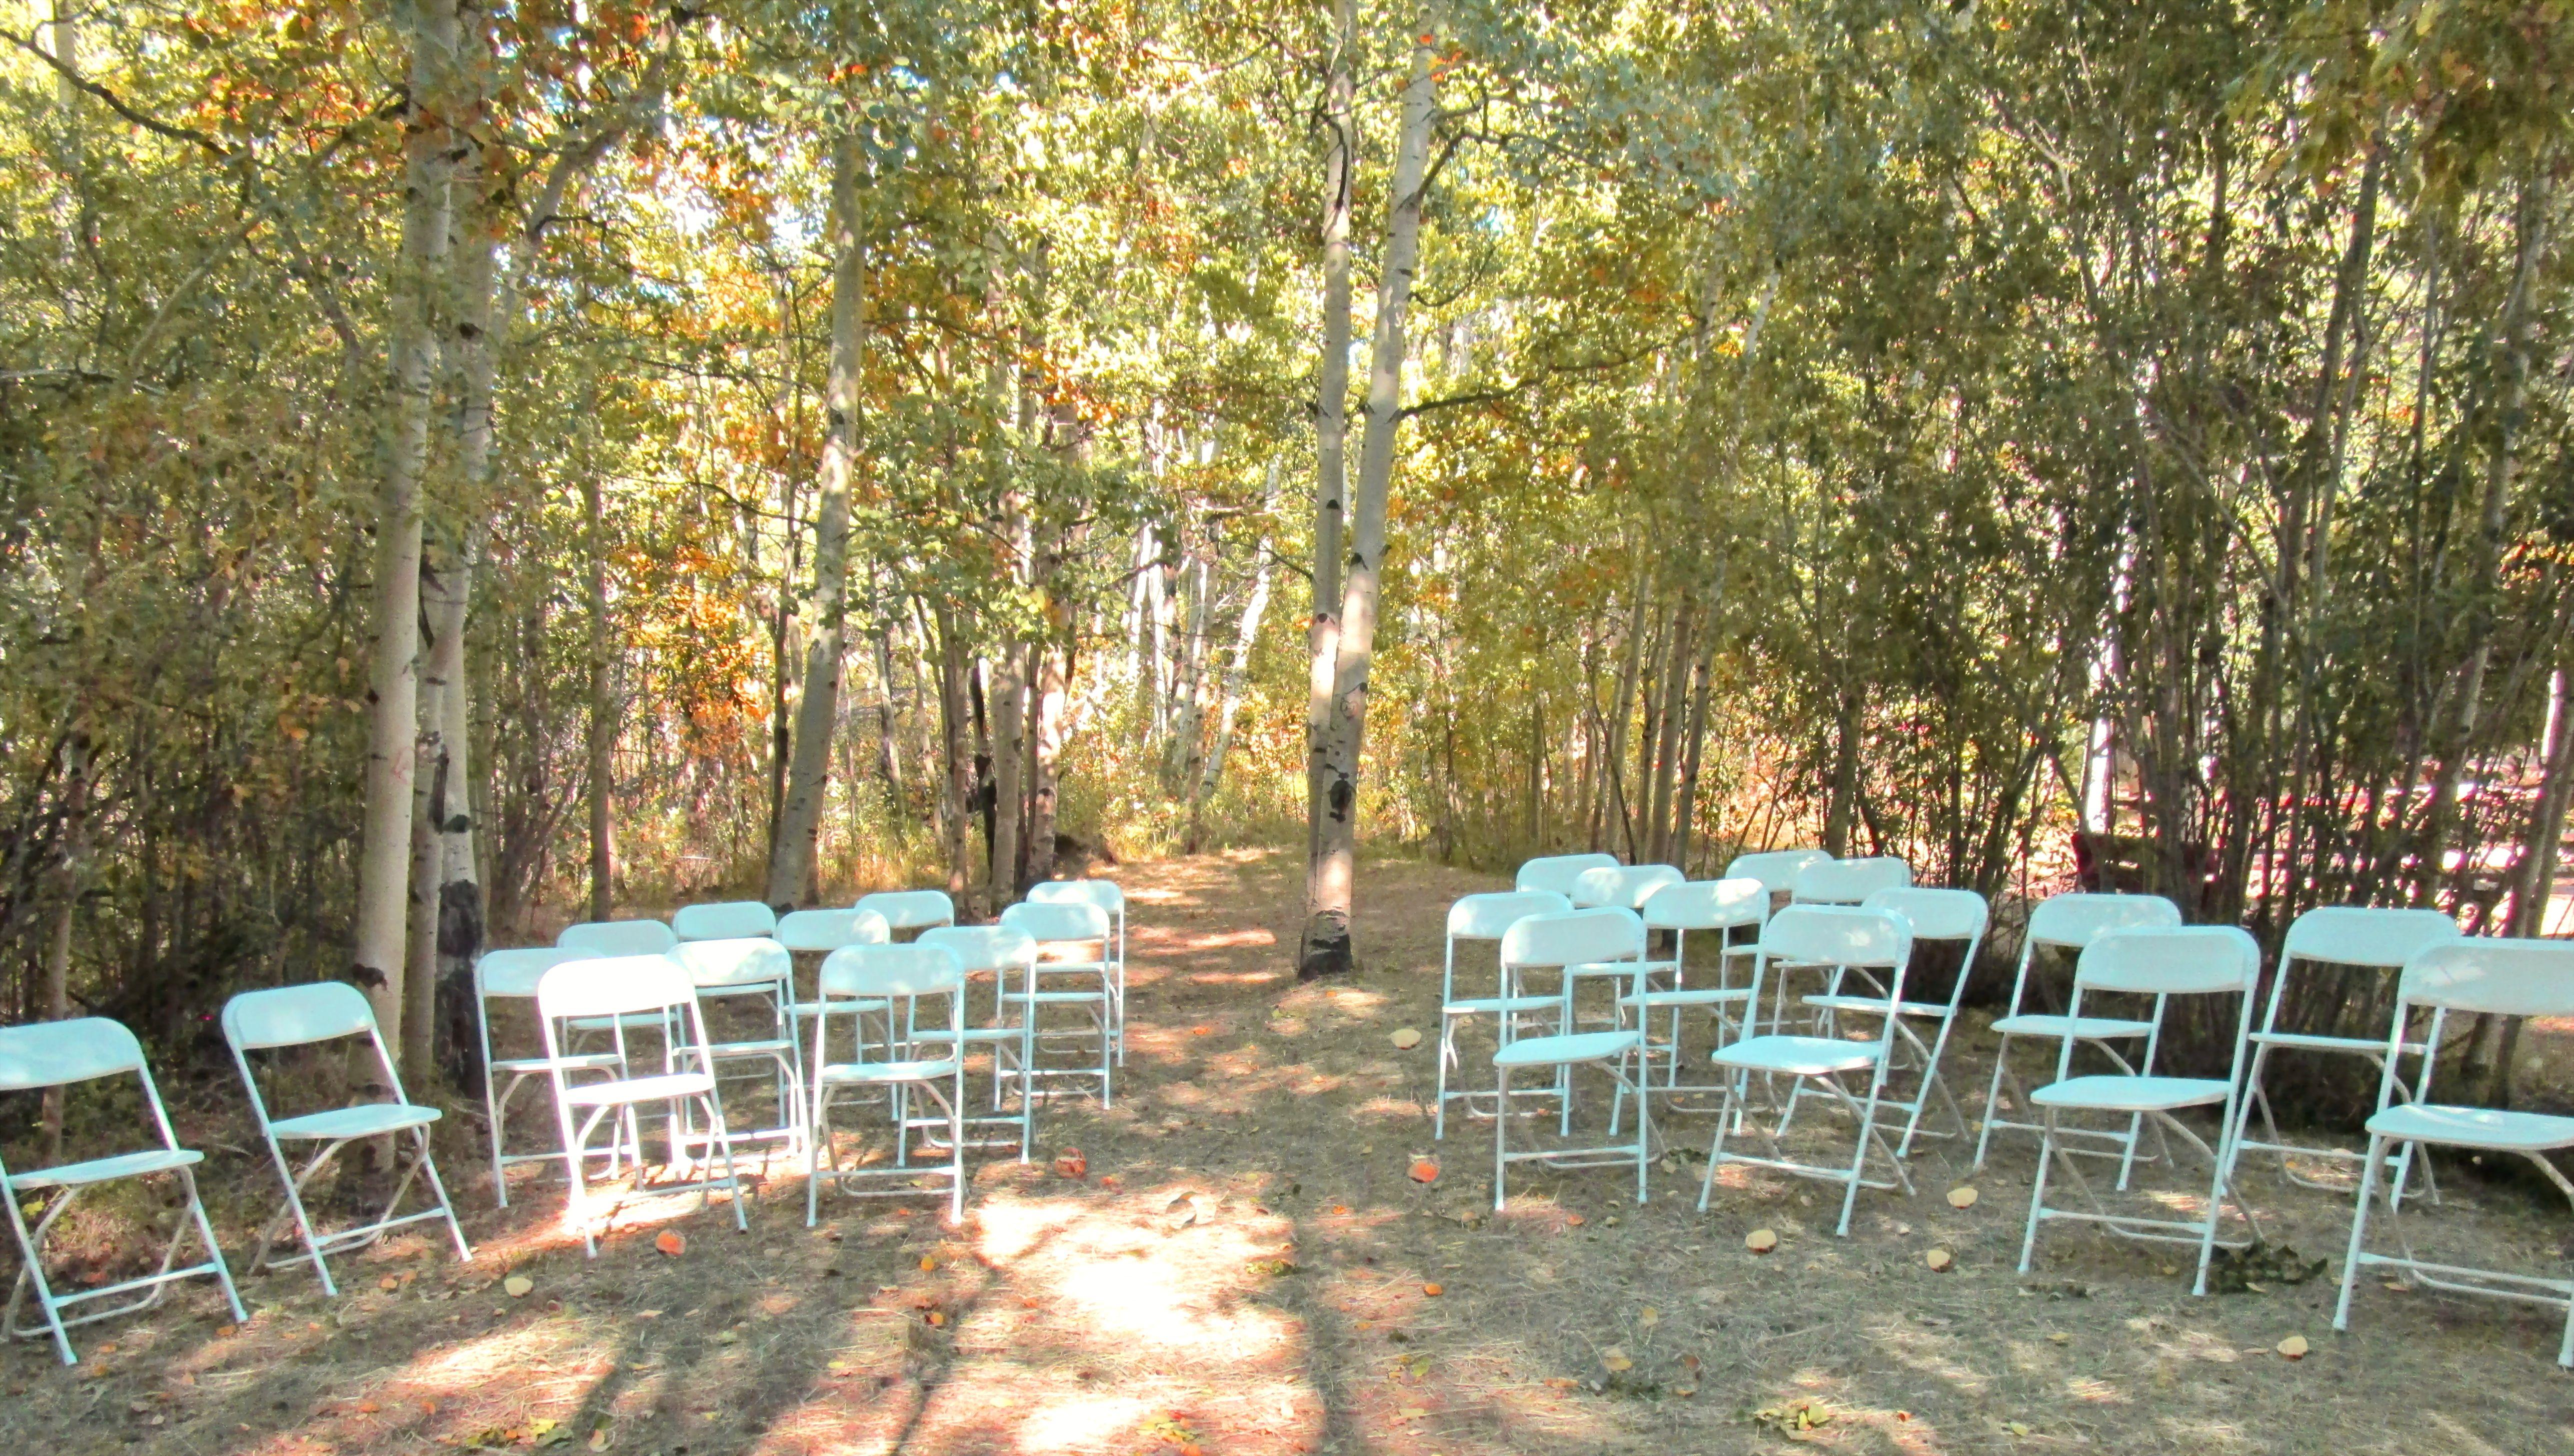 A Beautiful Fall Wedding Venue The Historic Pines Ranch: Beautiful Fall Wedding Venues At Reisefeber.org